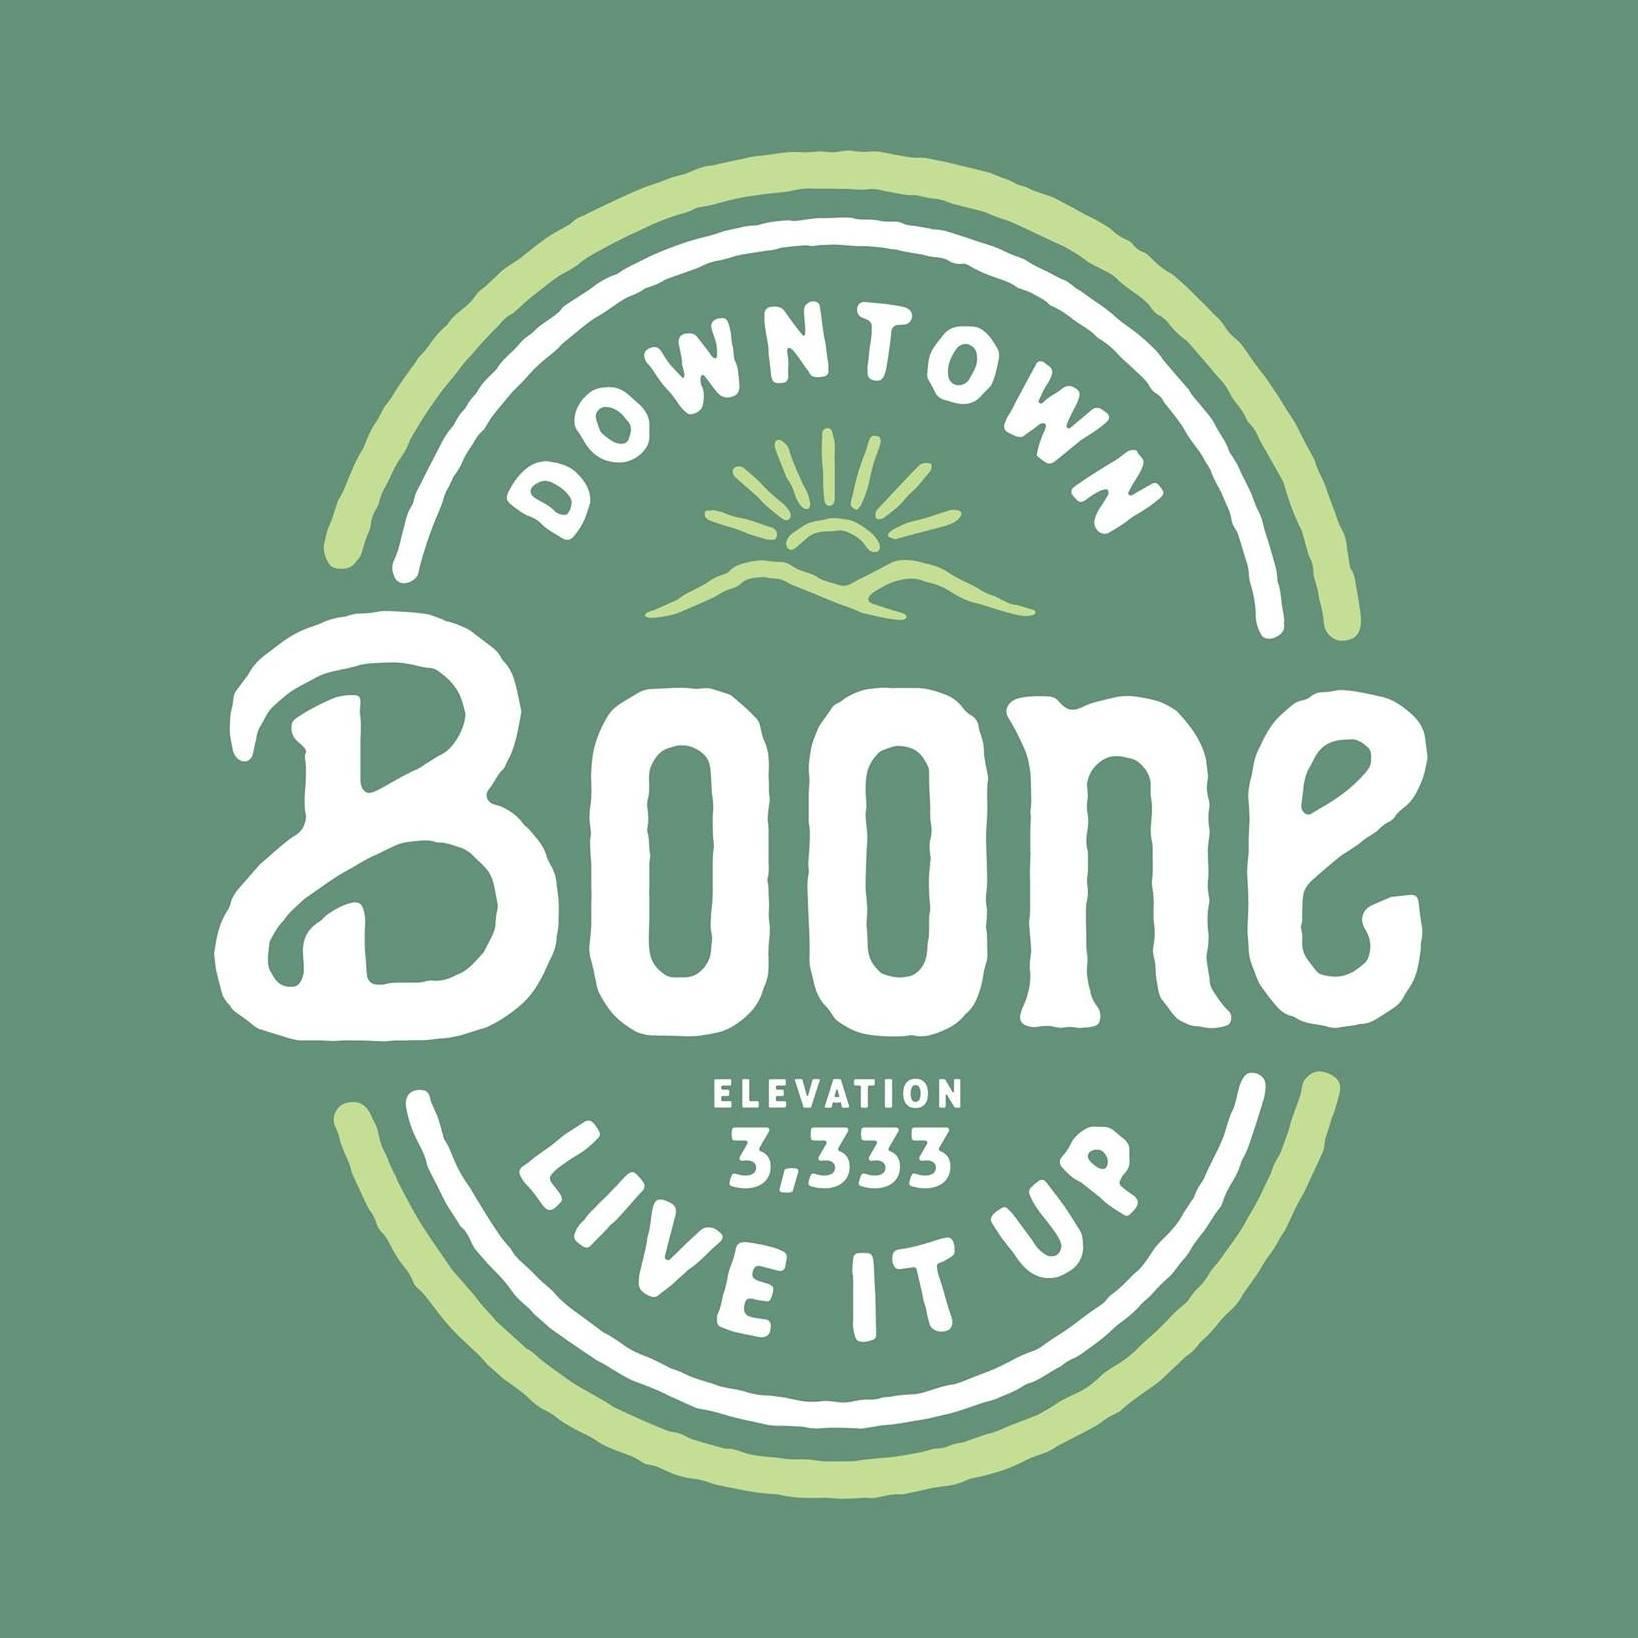 Downtown Boone Development Association Receives 2021 National Main Street Accreditation